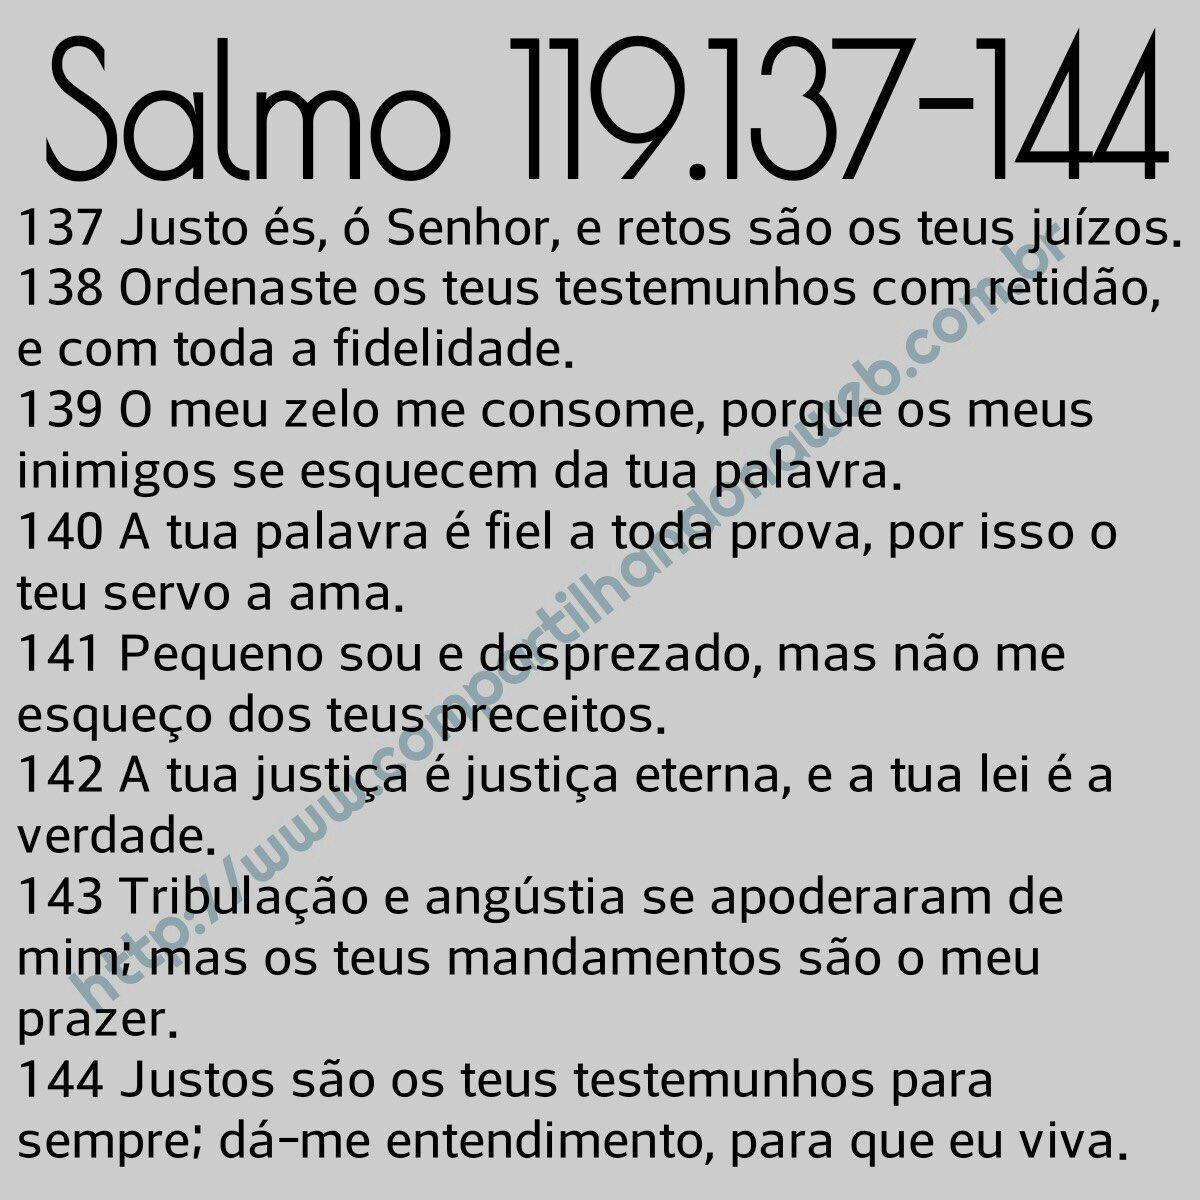 Português - Italiano - English - Español  https://t.co/EPemP9LaKP  https://t.co/EIaoHhBQxJ  #Bíblia #Biblia #Bible #Bibbia #CompartilhandoNaWeb #MinisterioCompartilhando https://t.co/8blERL98uE